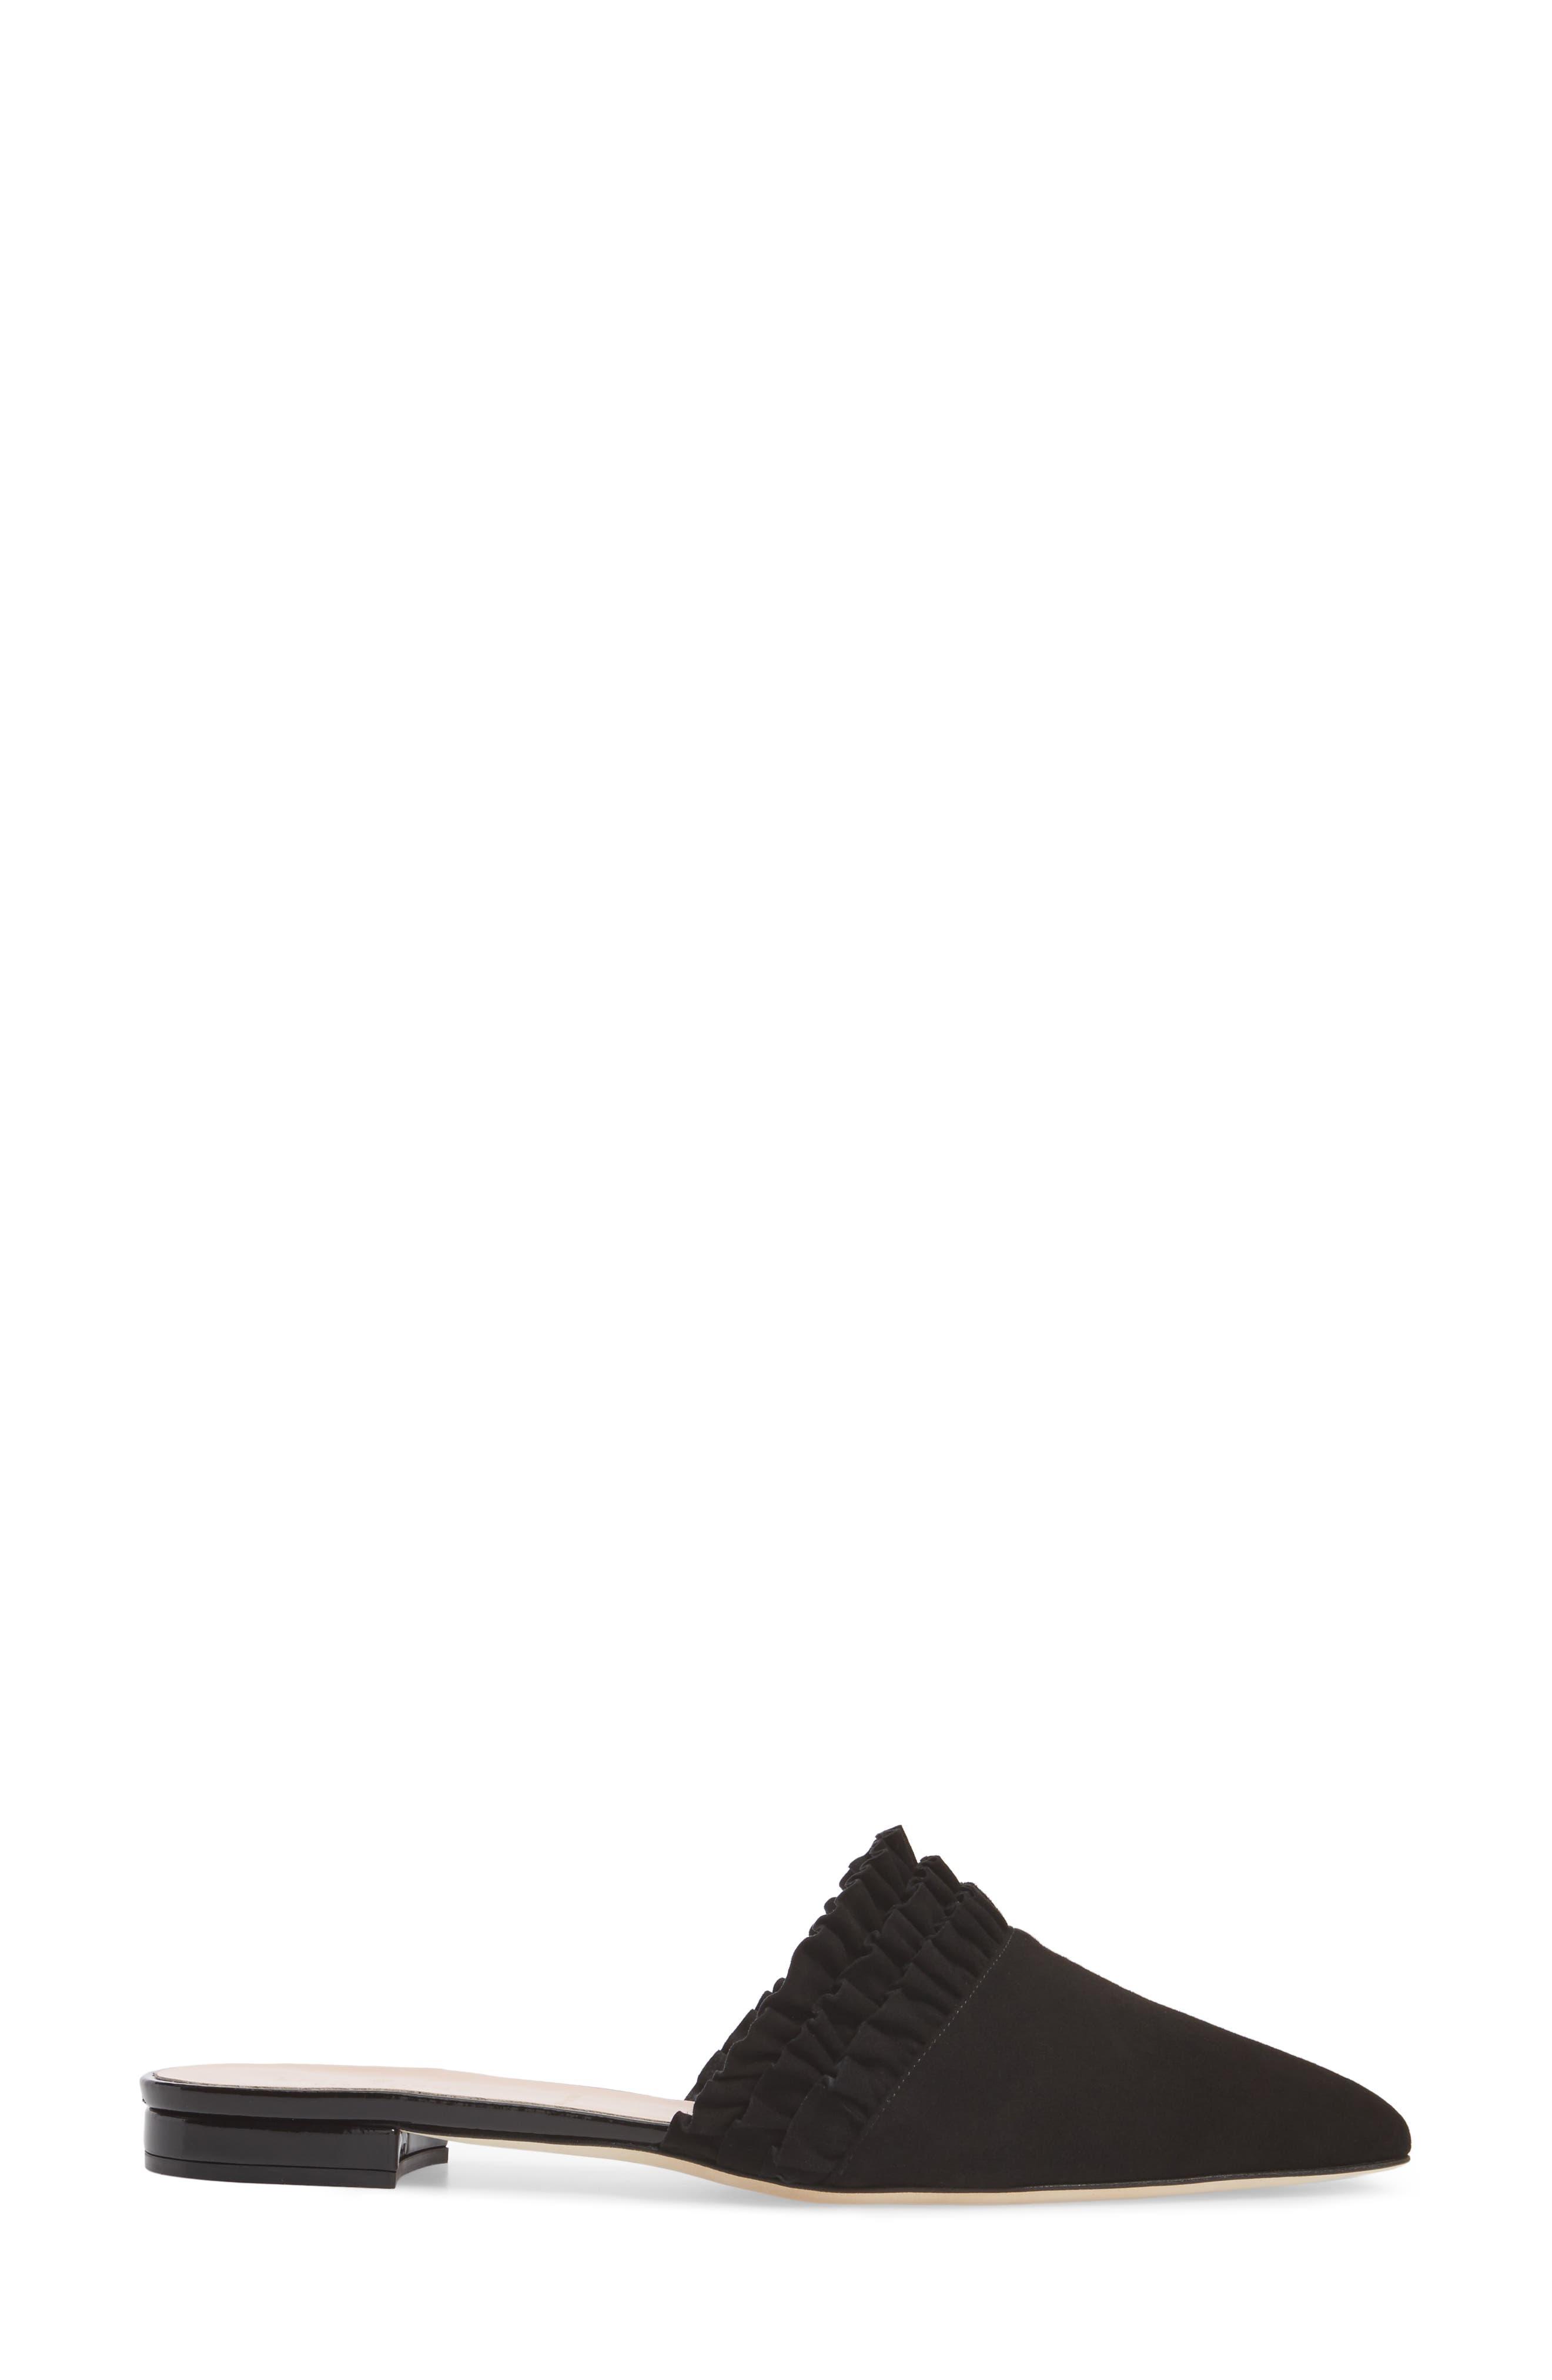 Alternate Image 3  - kate spade new york beatriz loafer flat (Women)